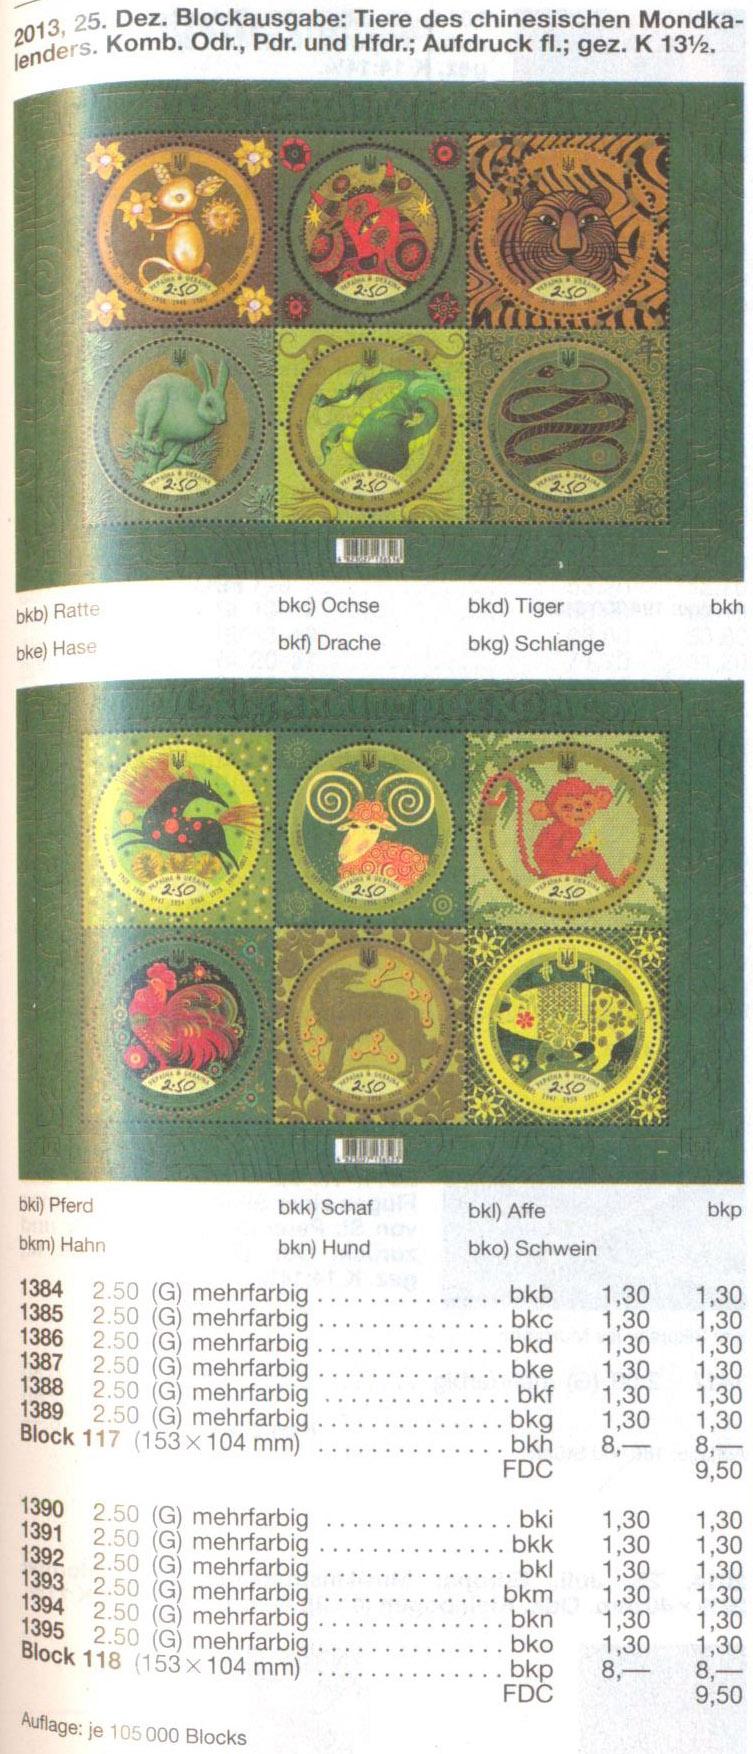 N1384-1389 (block117) каталог 2013 блок Гороскоп от крысы до змеи